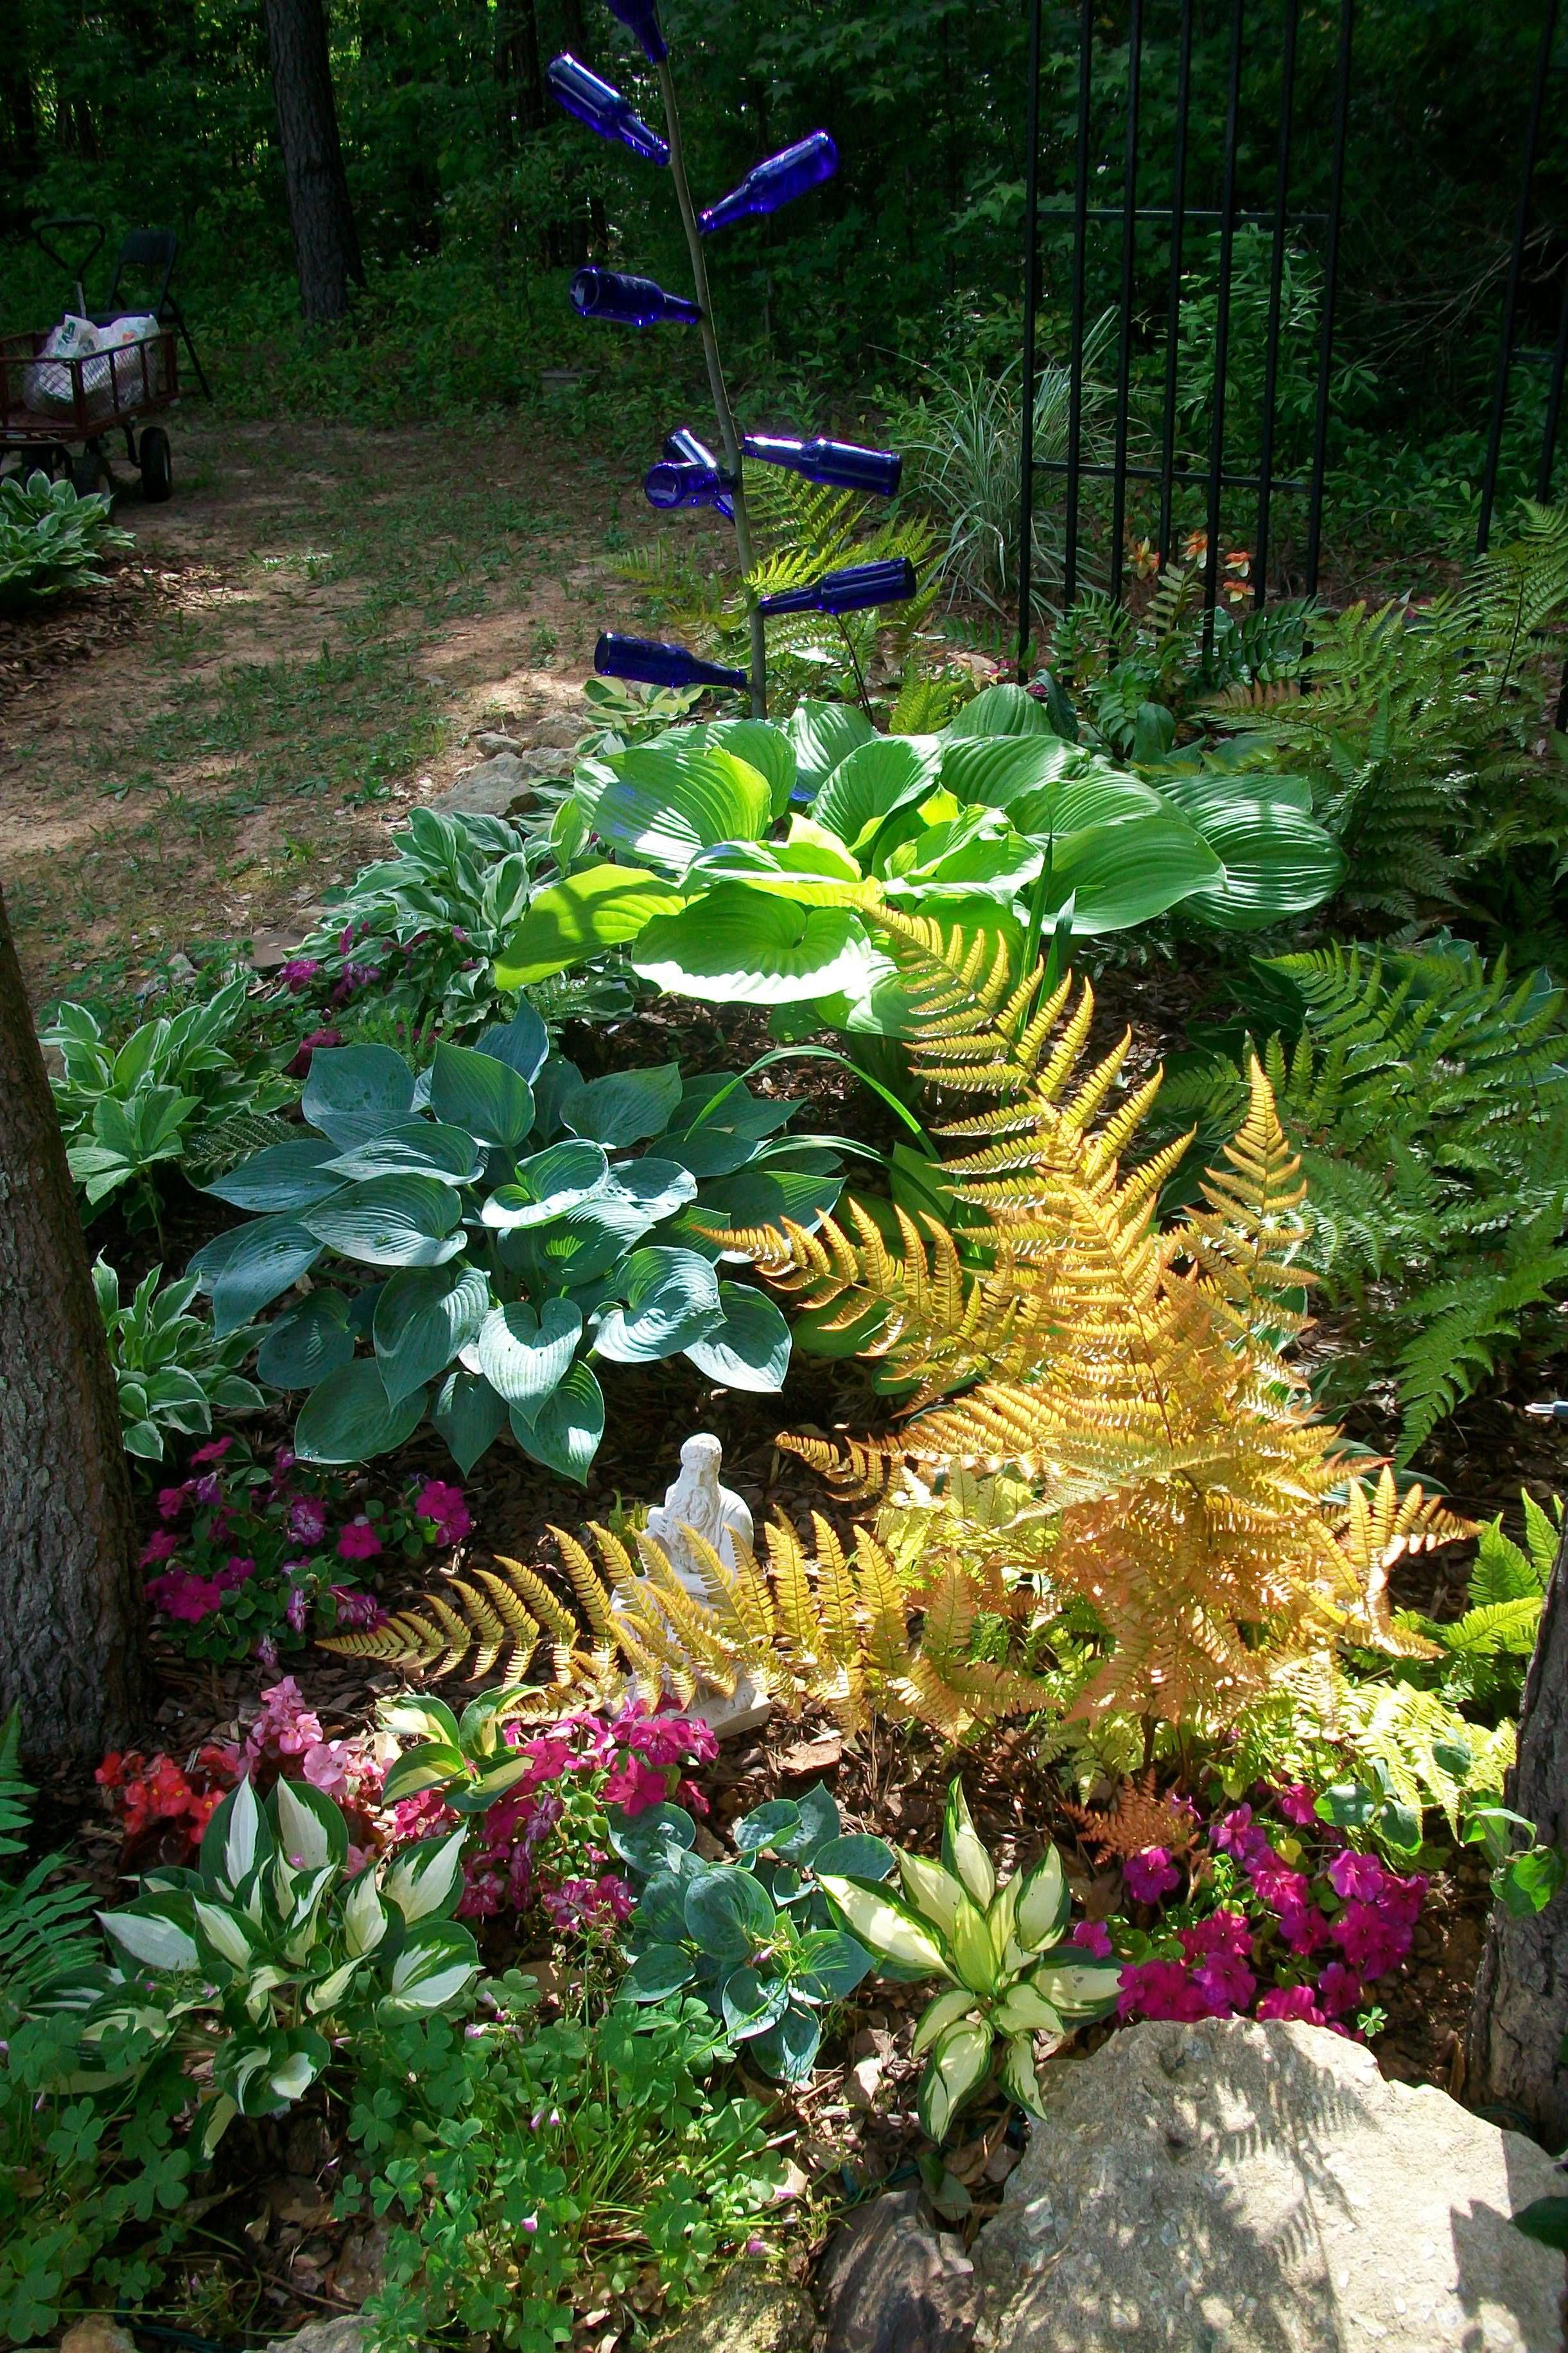 Hostas Autumn Ferns Impatiens Lenton Roses Make A Wonderful Shade Garden With Images